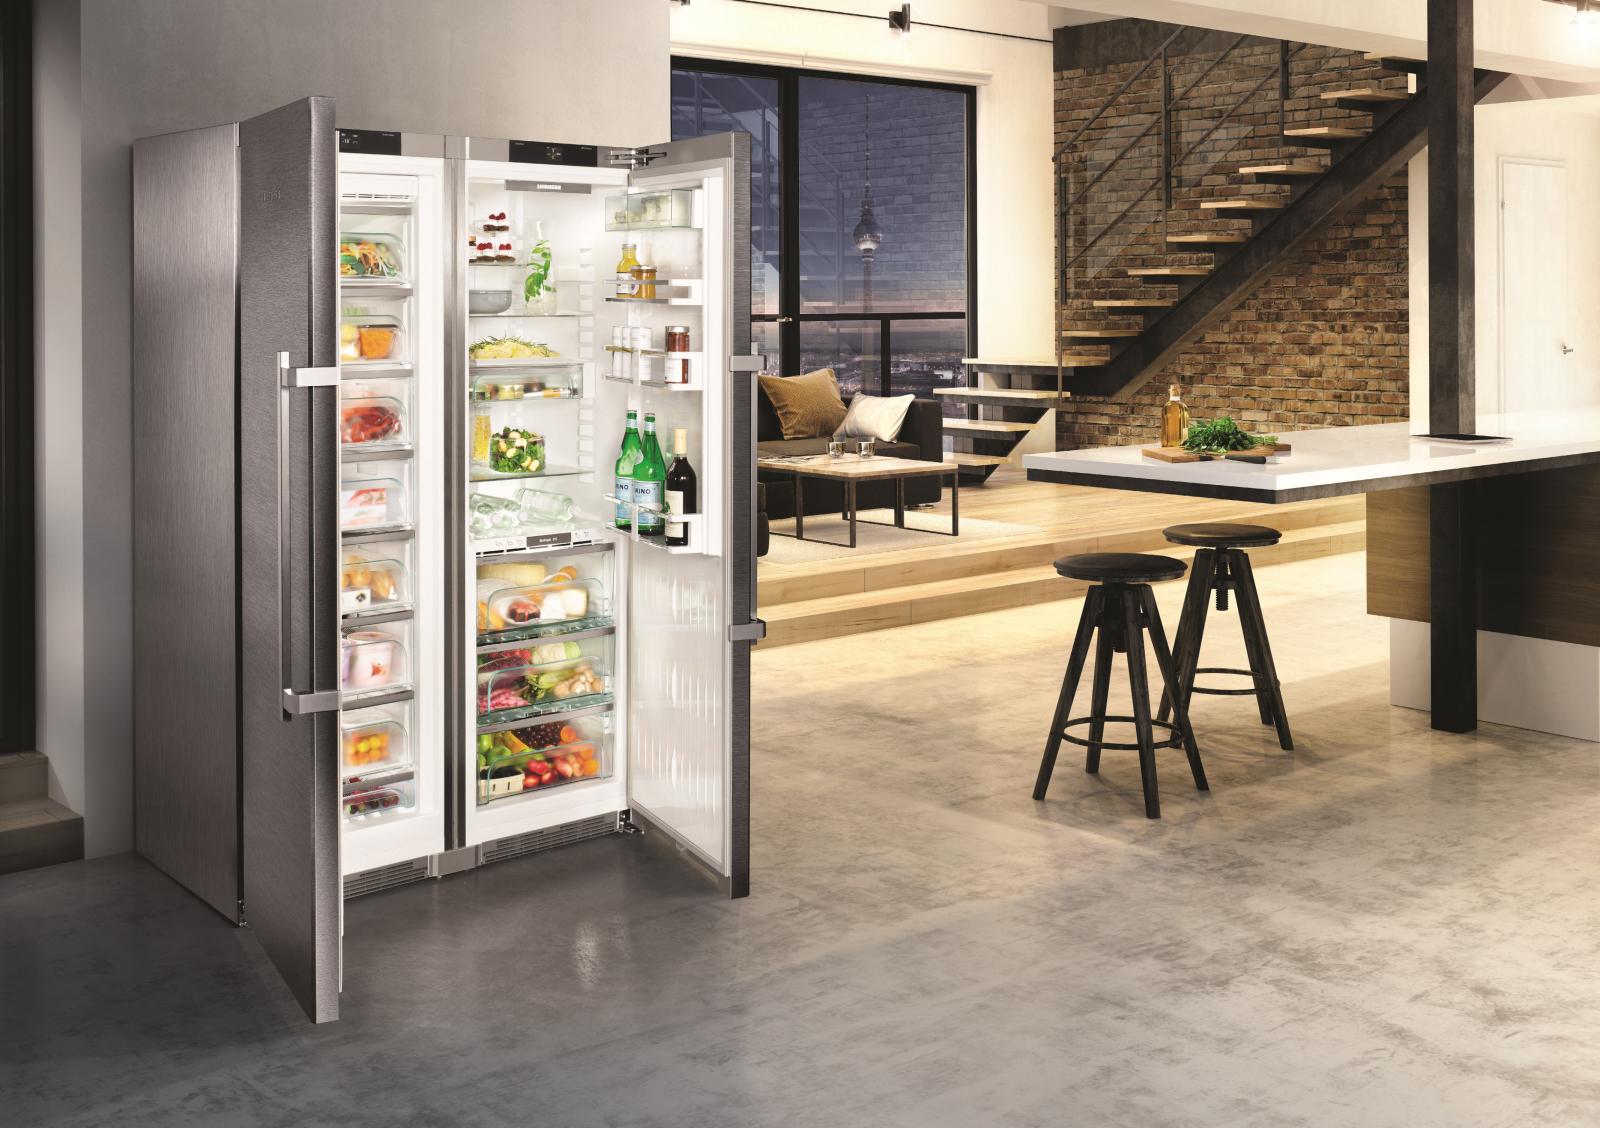 купить Side-by-Side холодильник Liebherr SBSes 8663 Украина фото 8